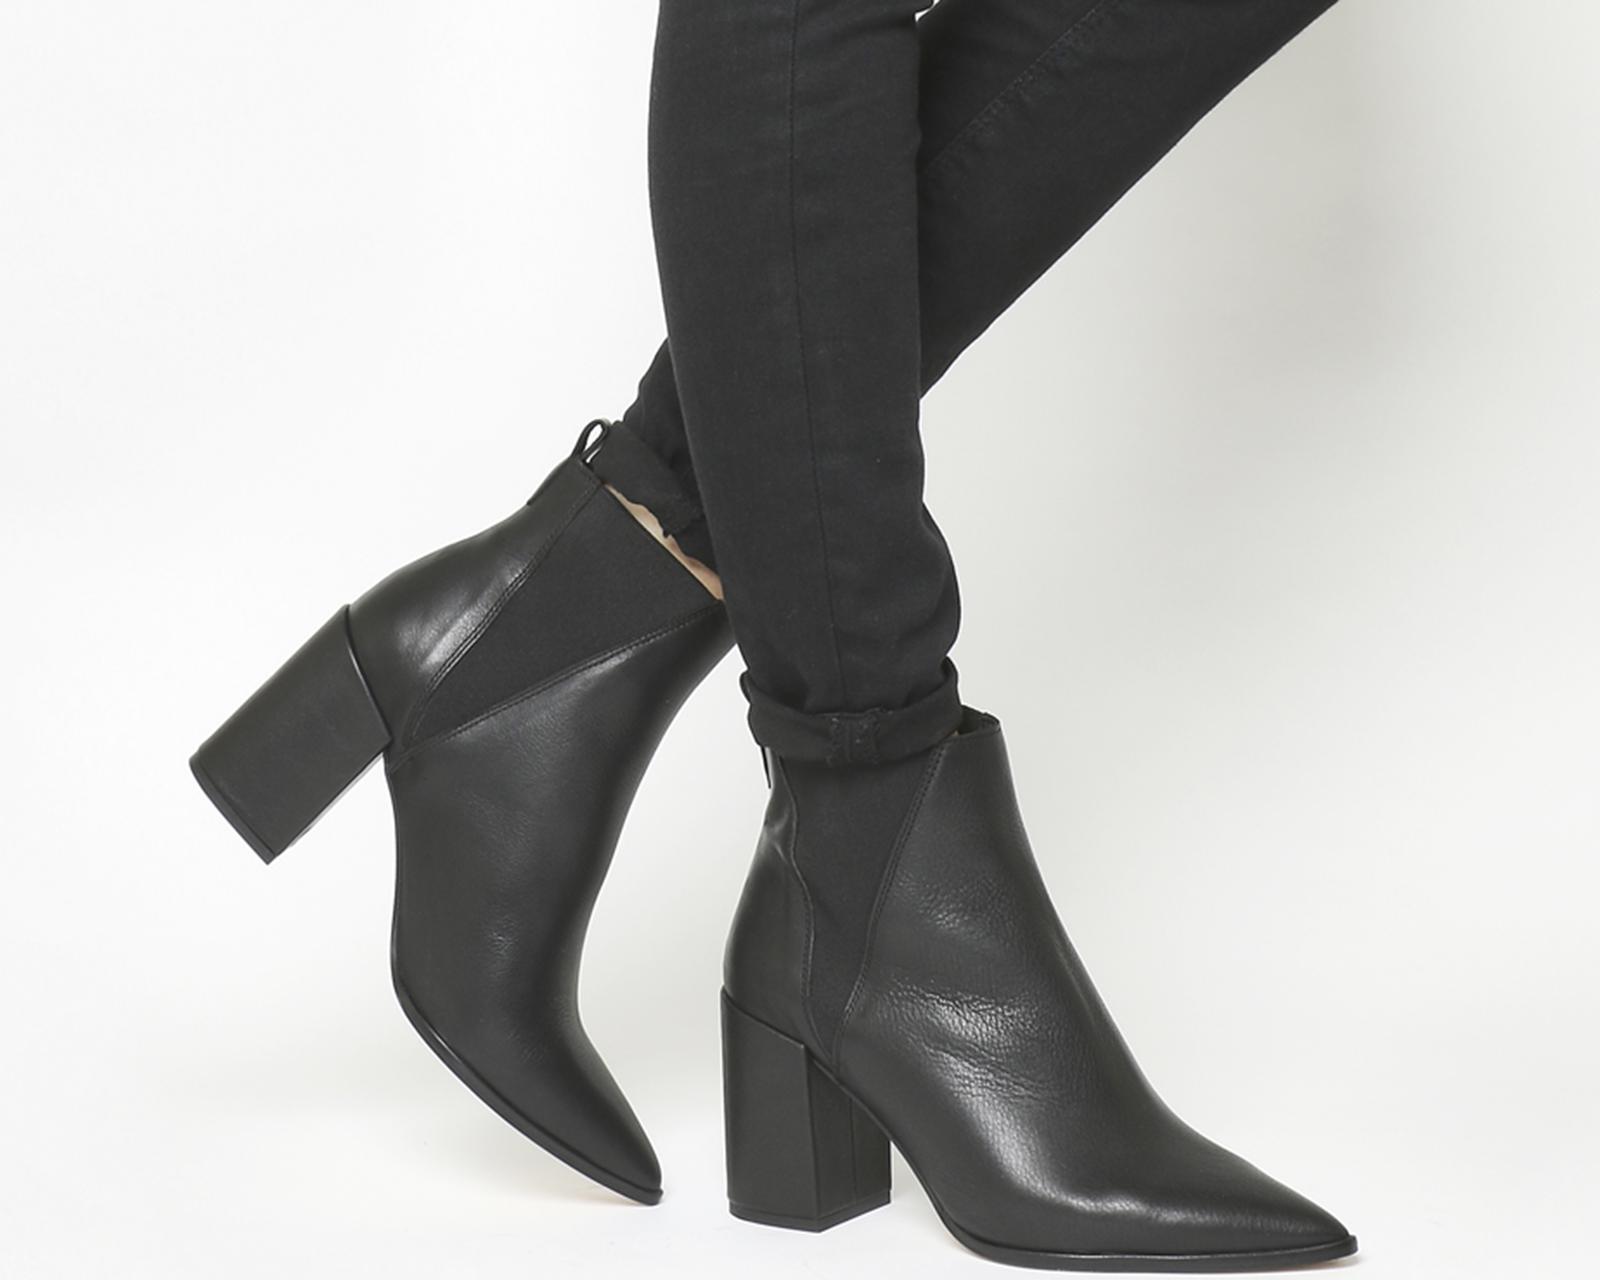 934b479adfe Office Amaze High Cut Chelsea Boots in Black - Lyst